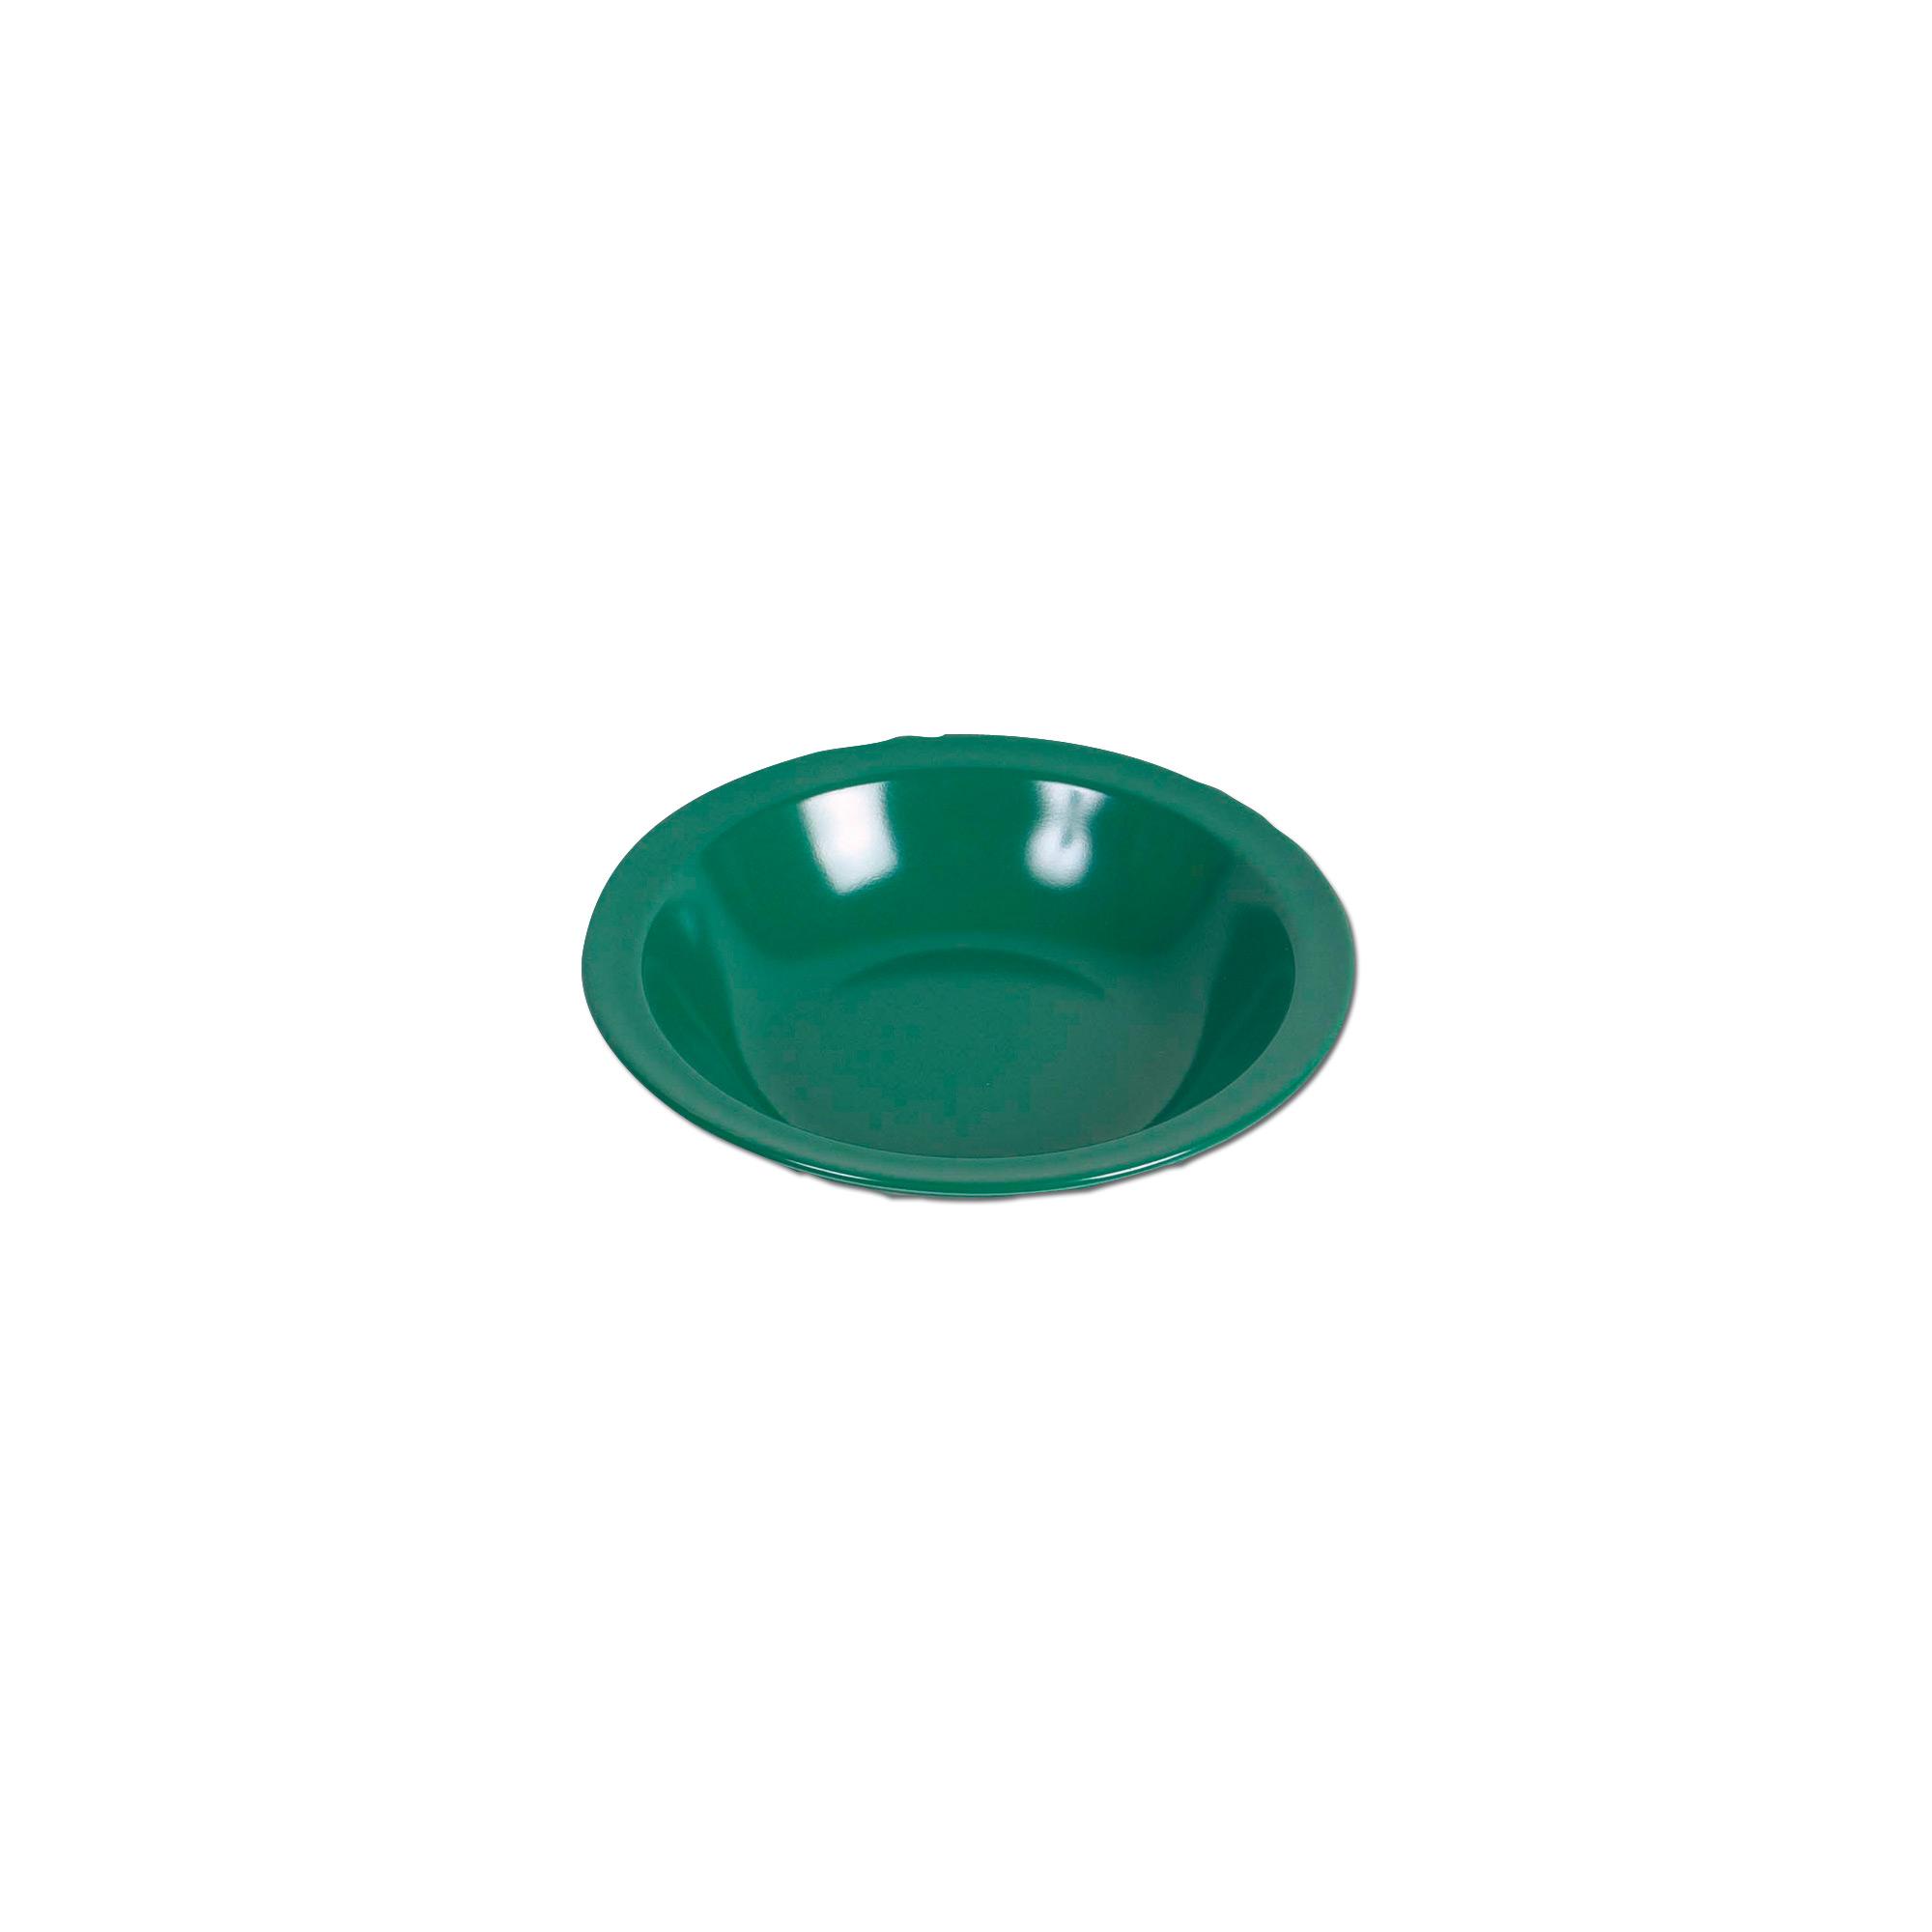 Melamin soup plate green